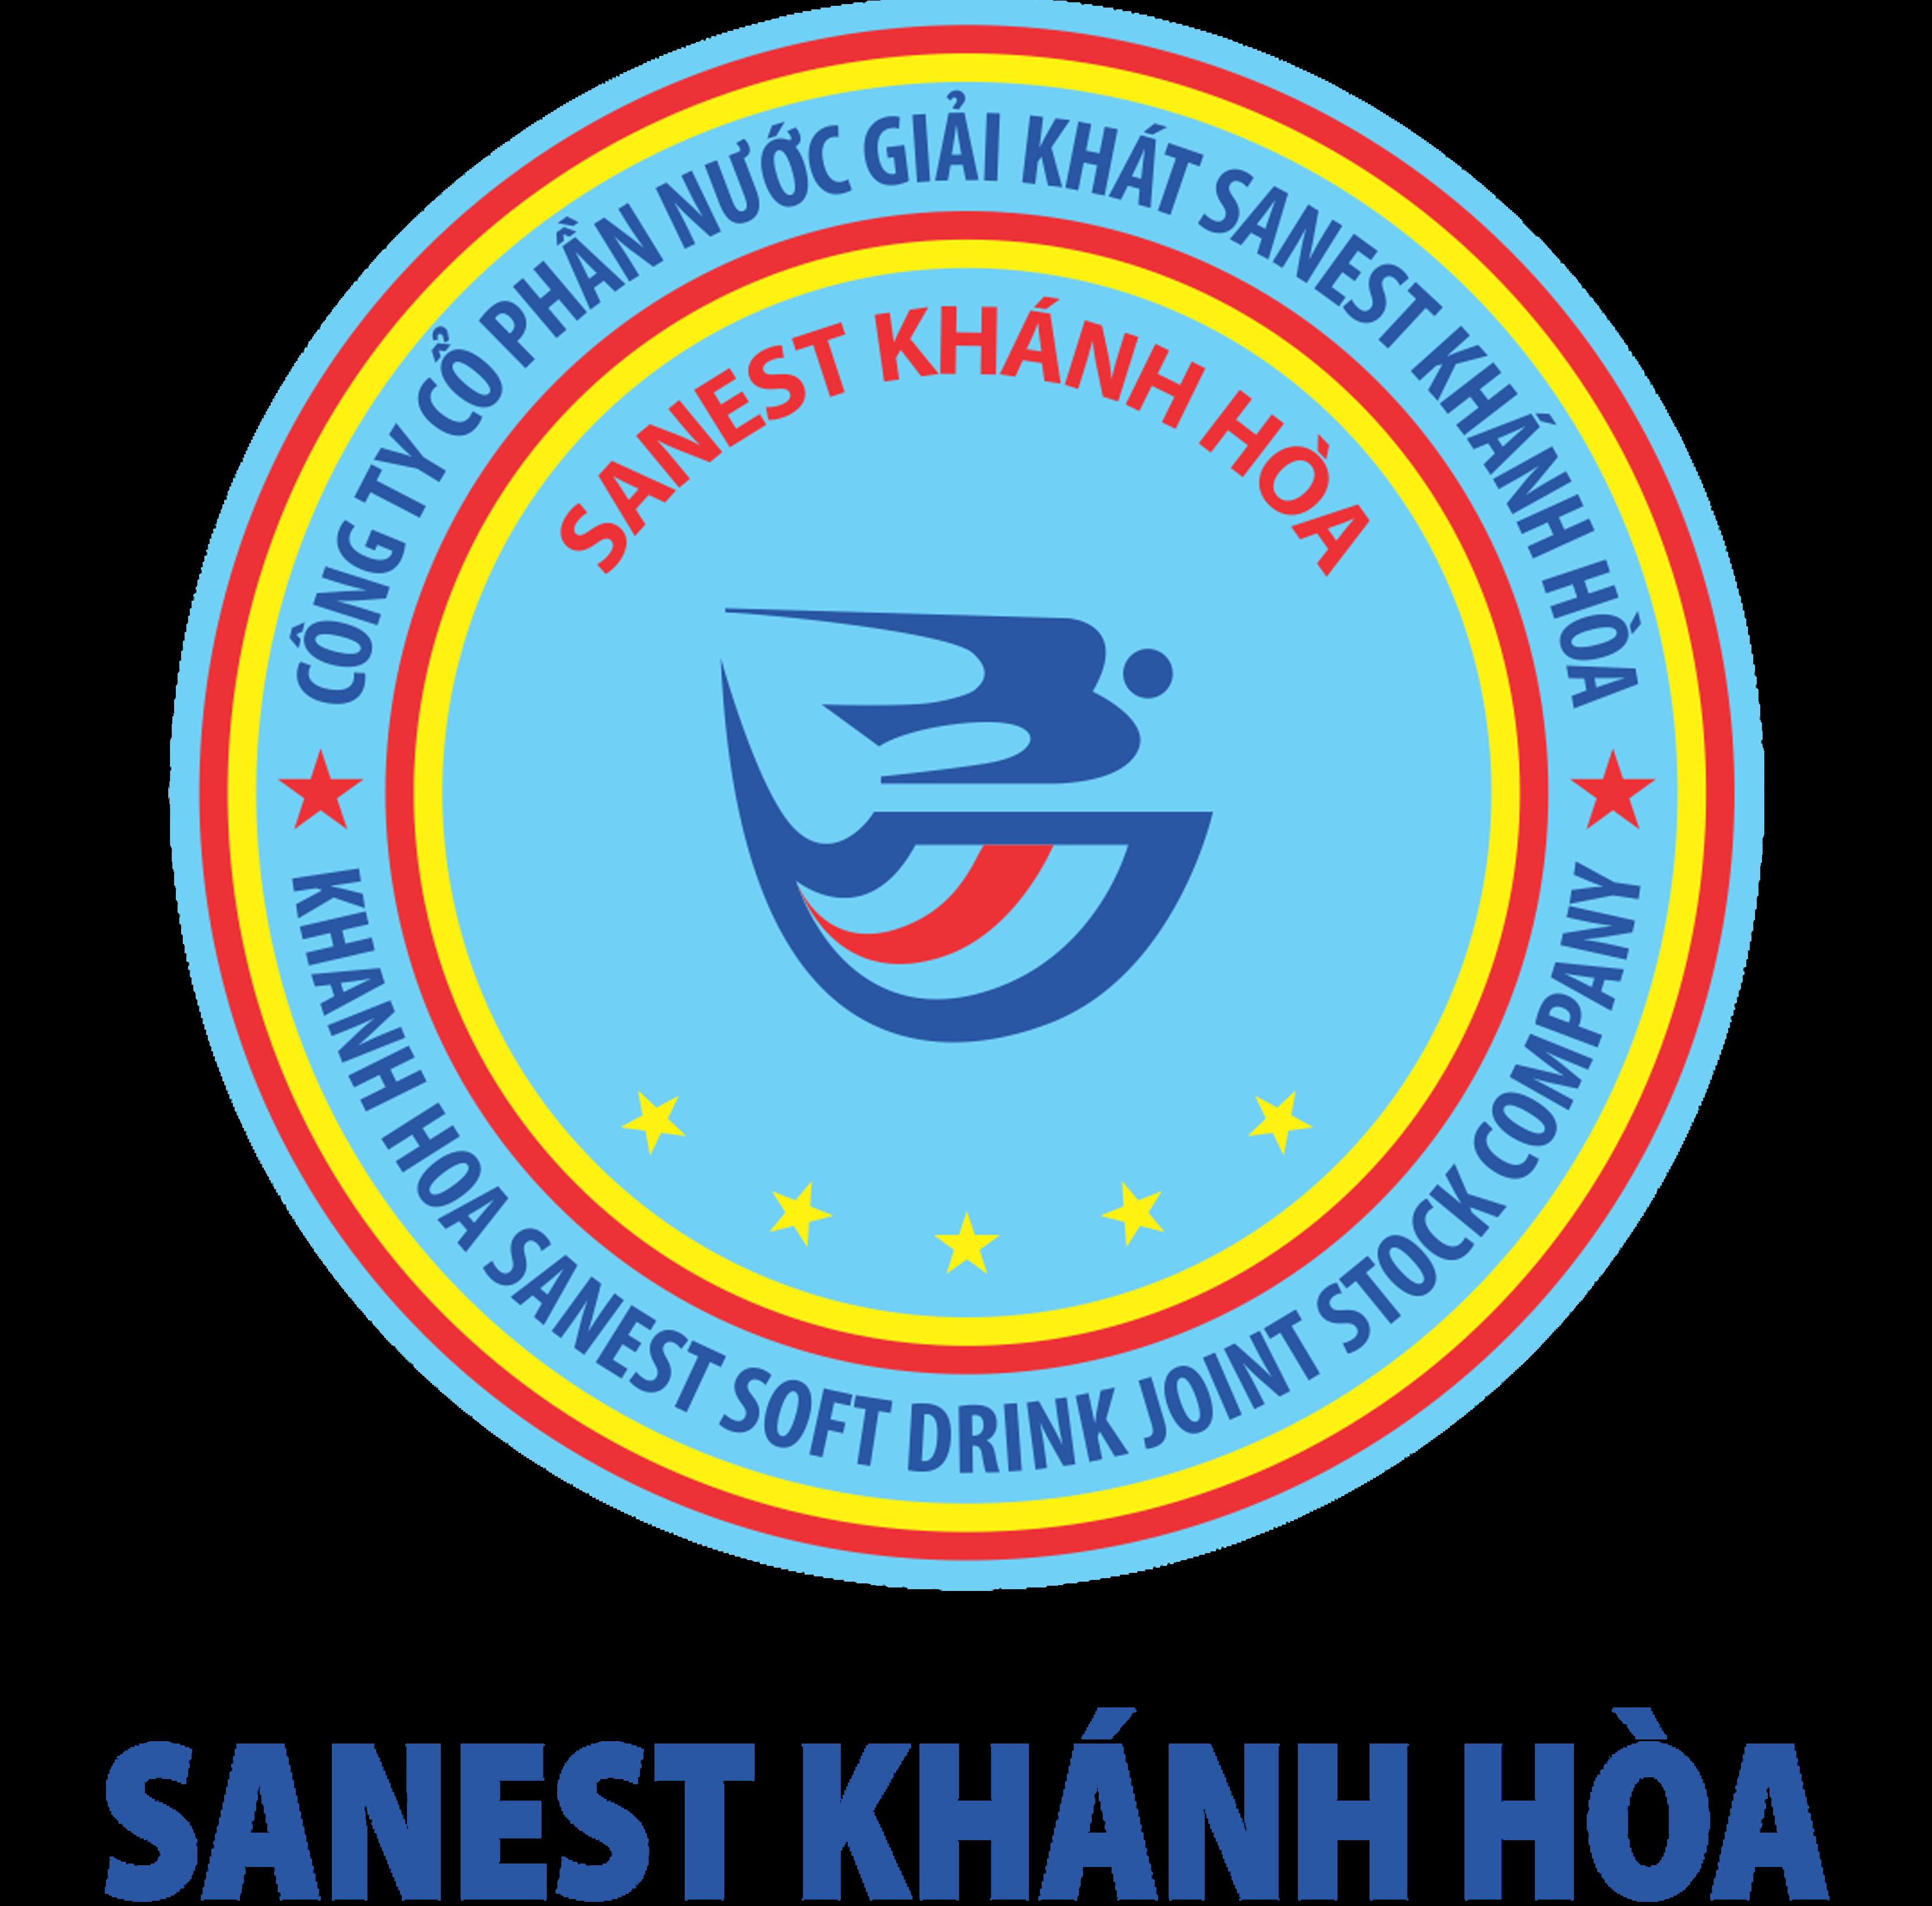 KHANH HOA SANEST SOFT DRINK JOINT STOCK COMPANY